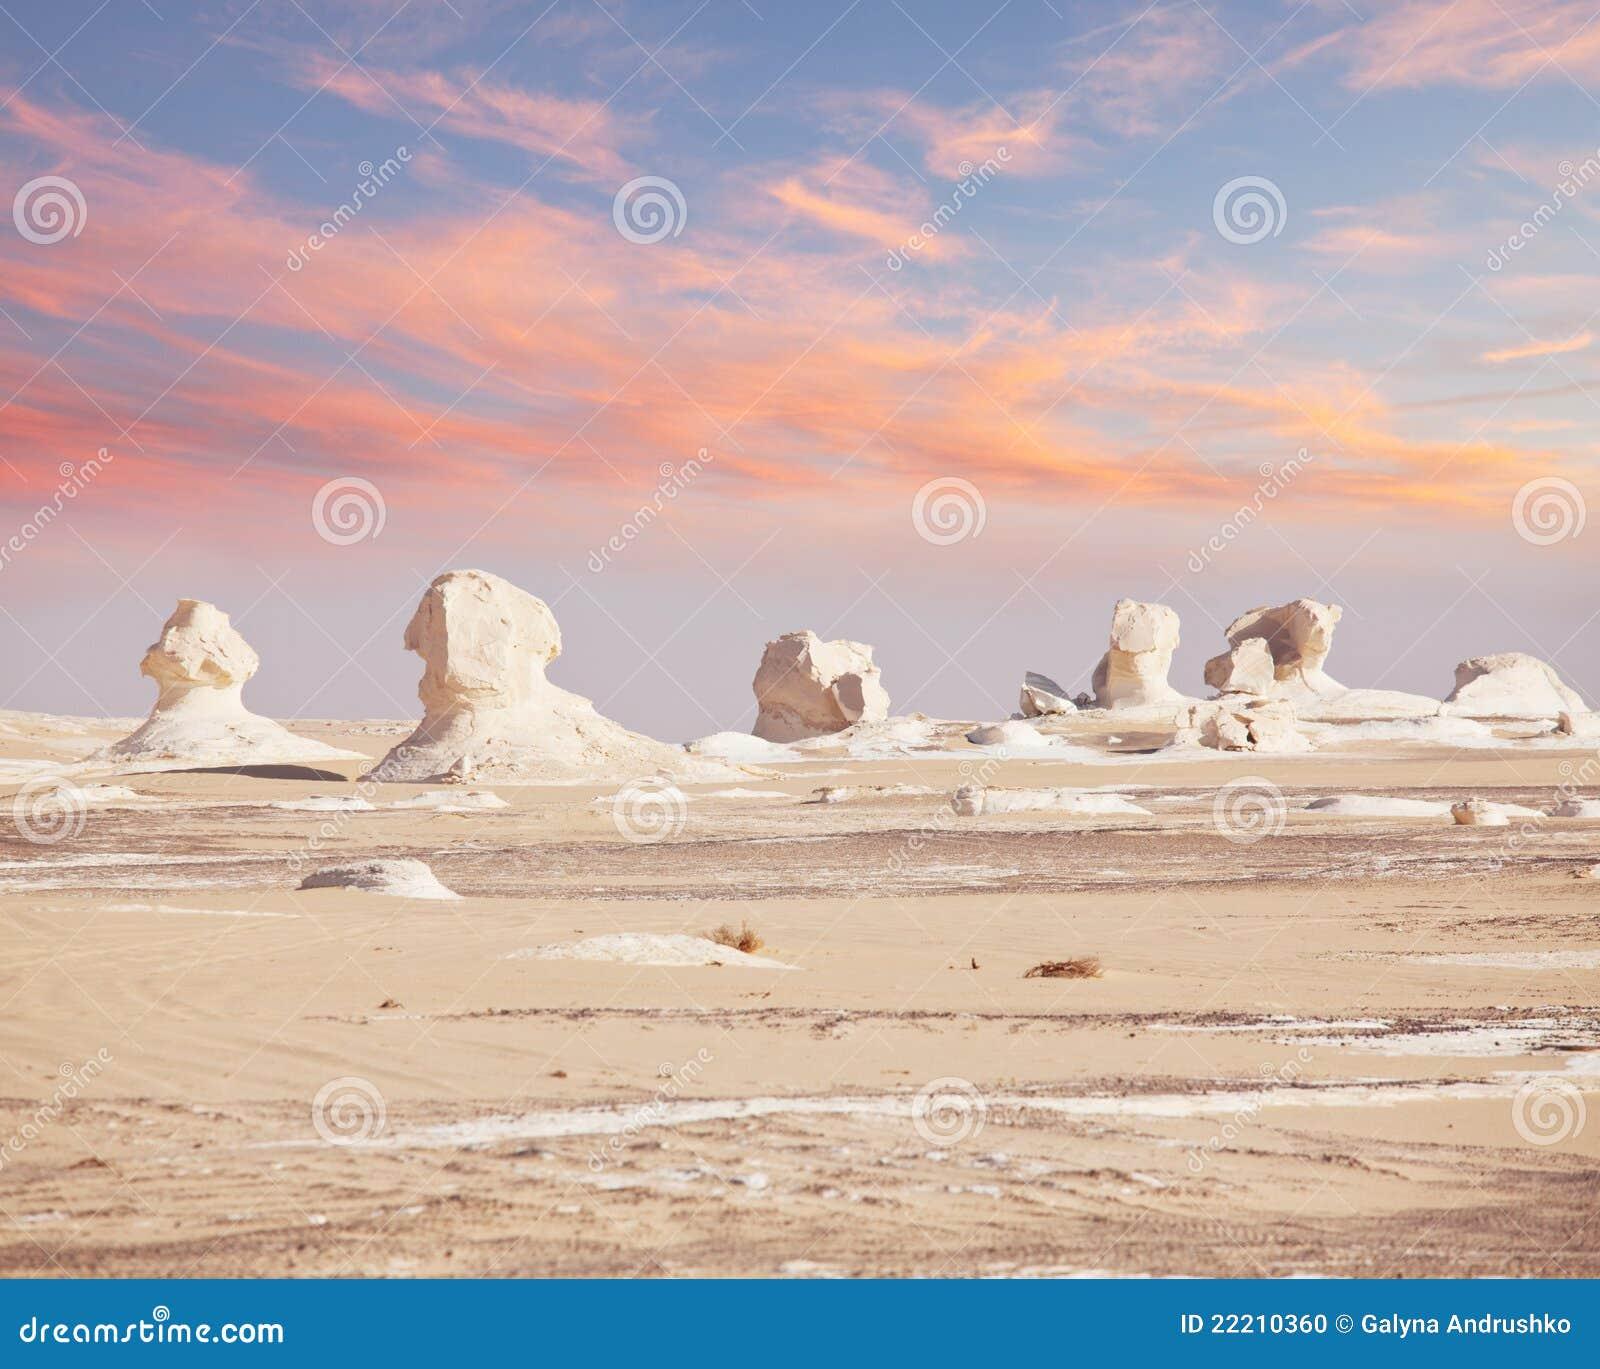 Deserto branco em Egipto